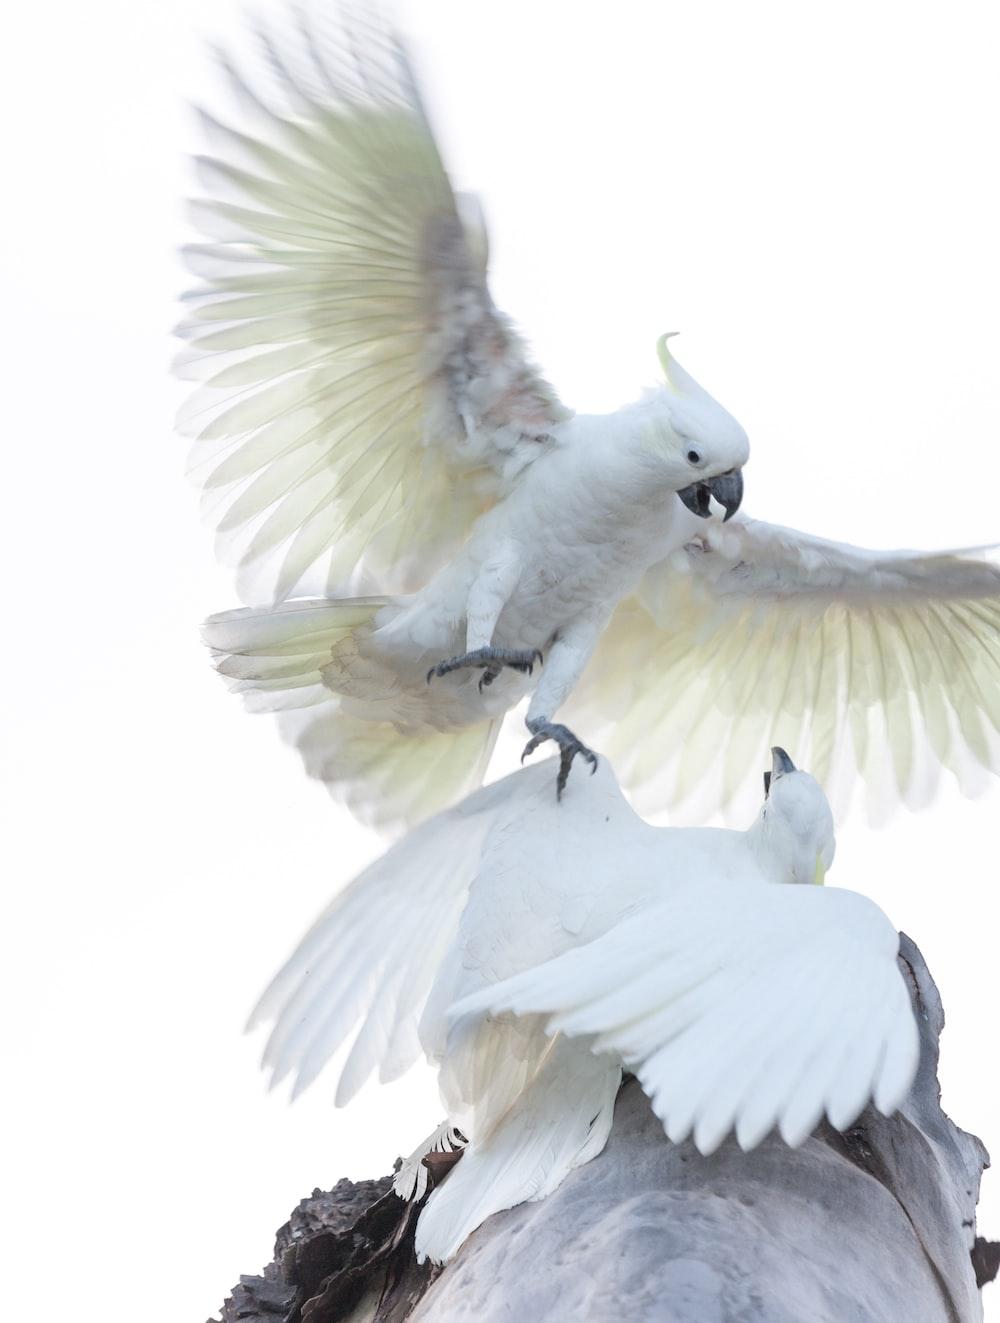 white bird with black beak